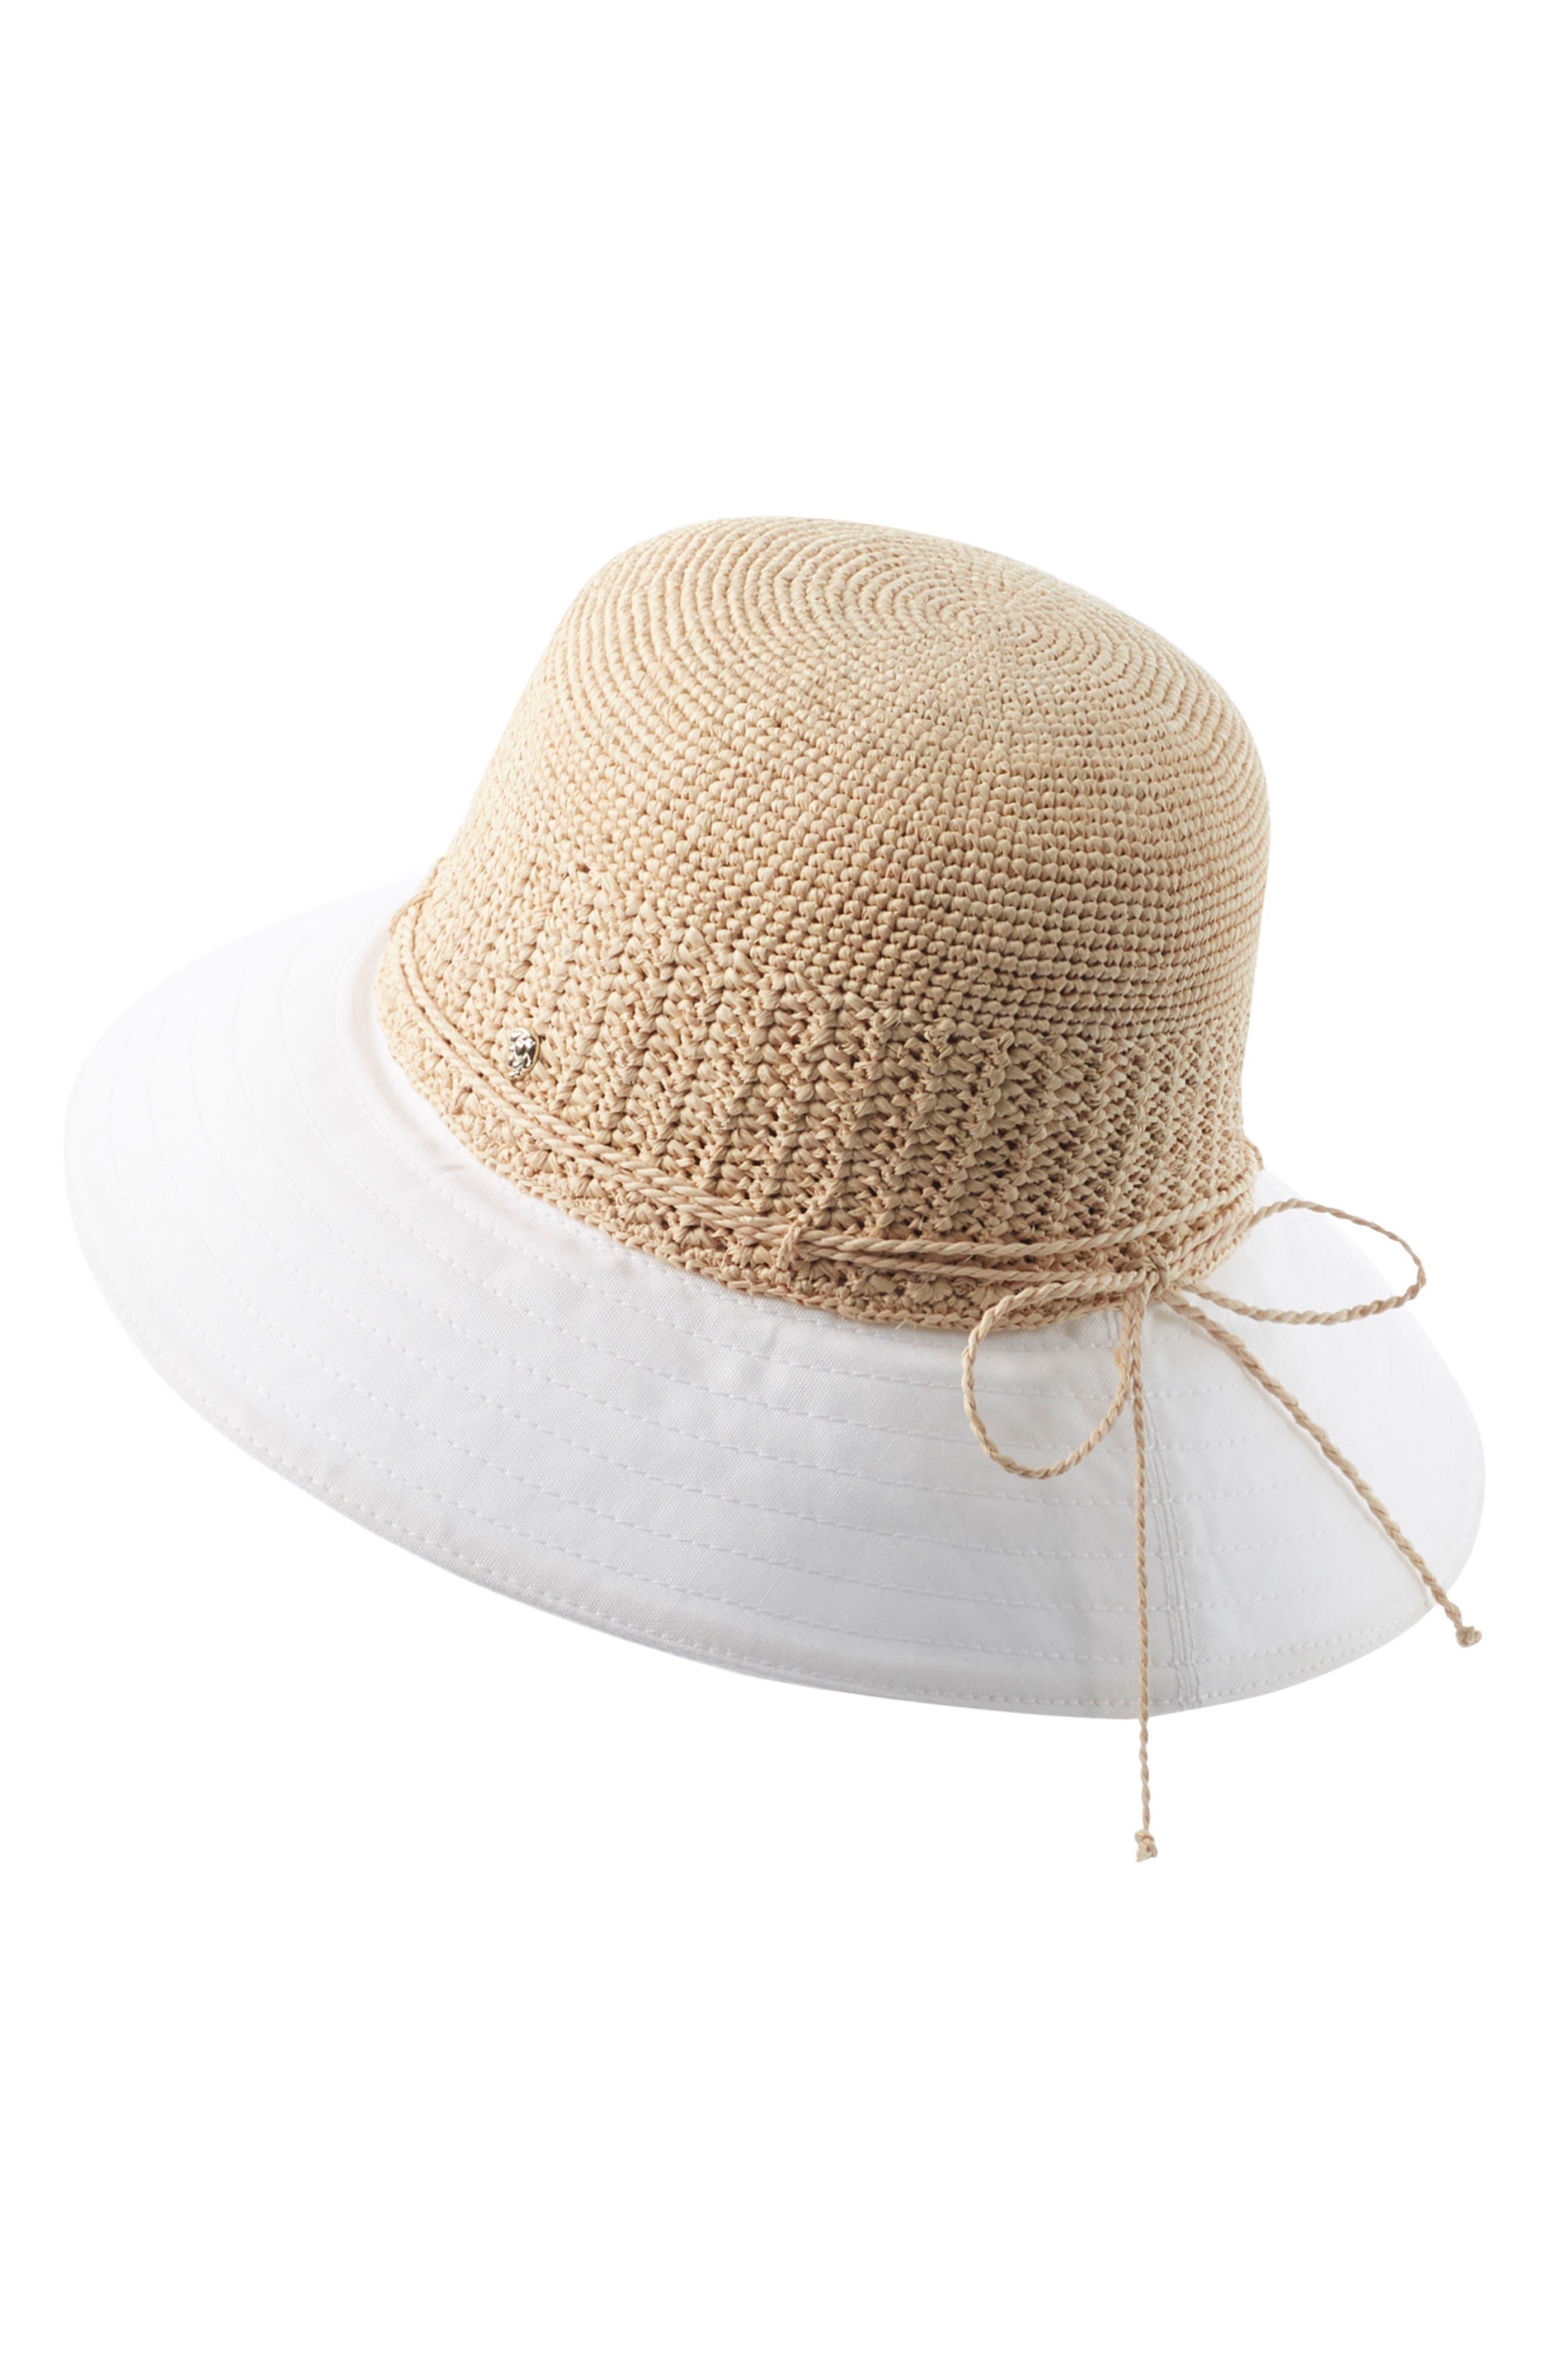 Cotton Brim Raffia Hat,                             Main thumbnail 1, color,                             Natural/ White